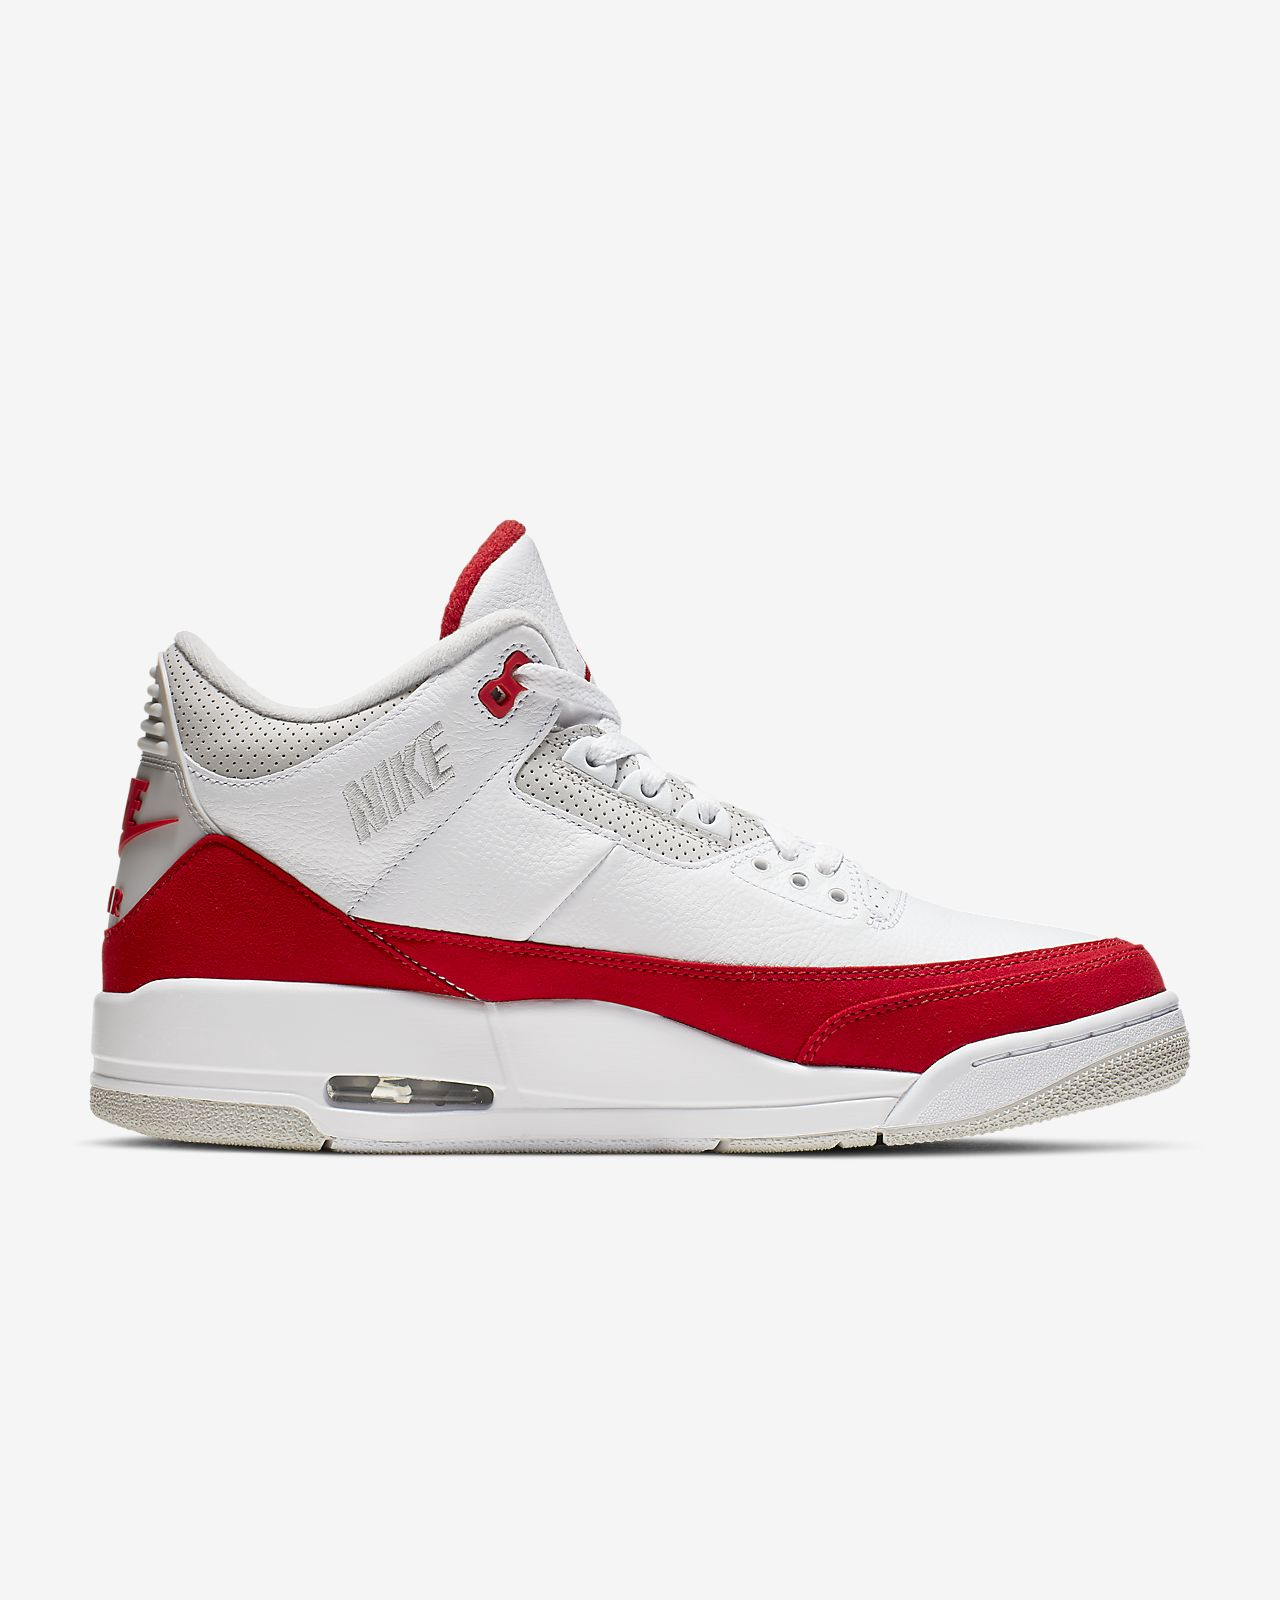 f475fab69d7 Air Jordan 3 Retro TH SP Men's Shoe. Nike.com